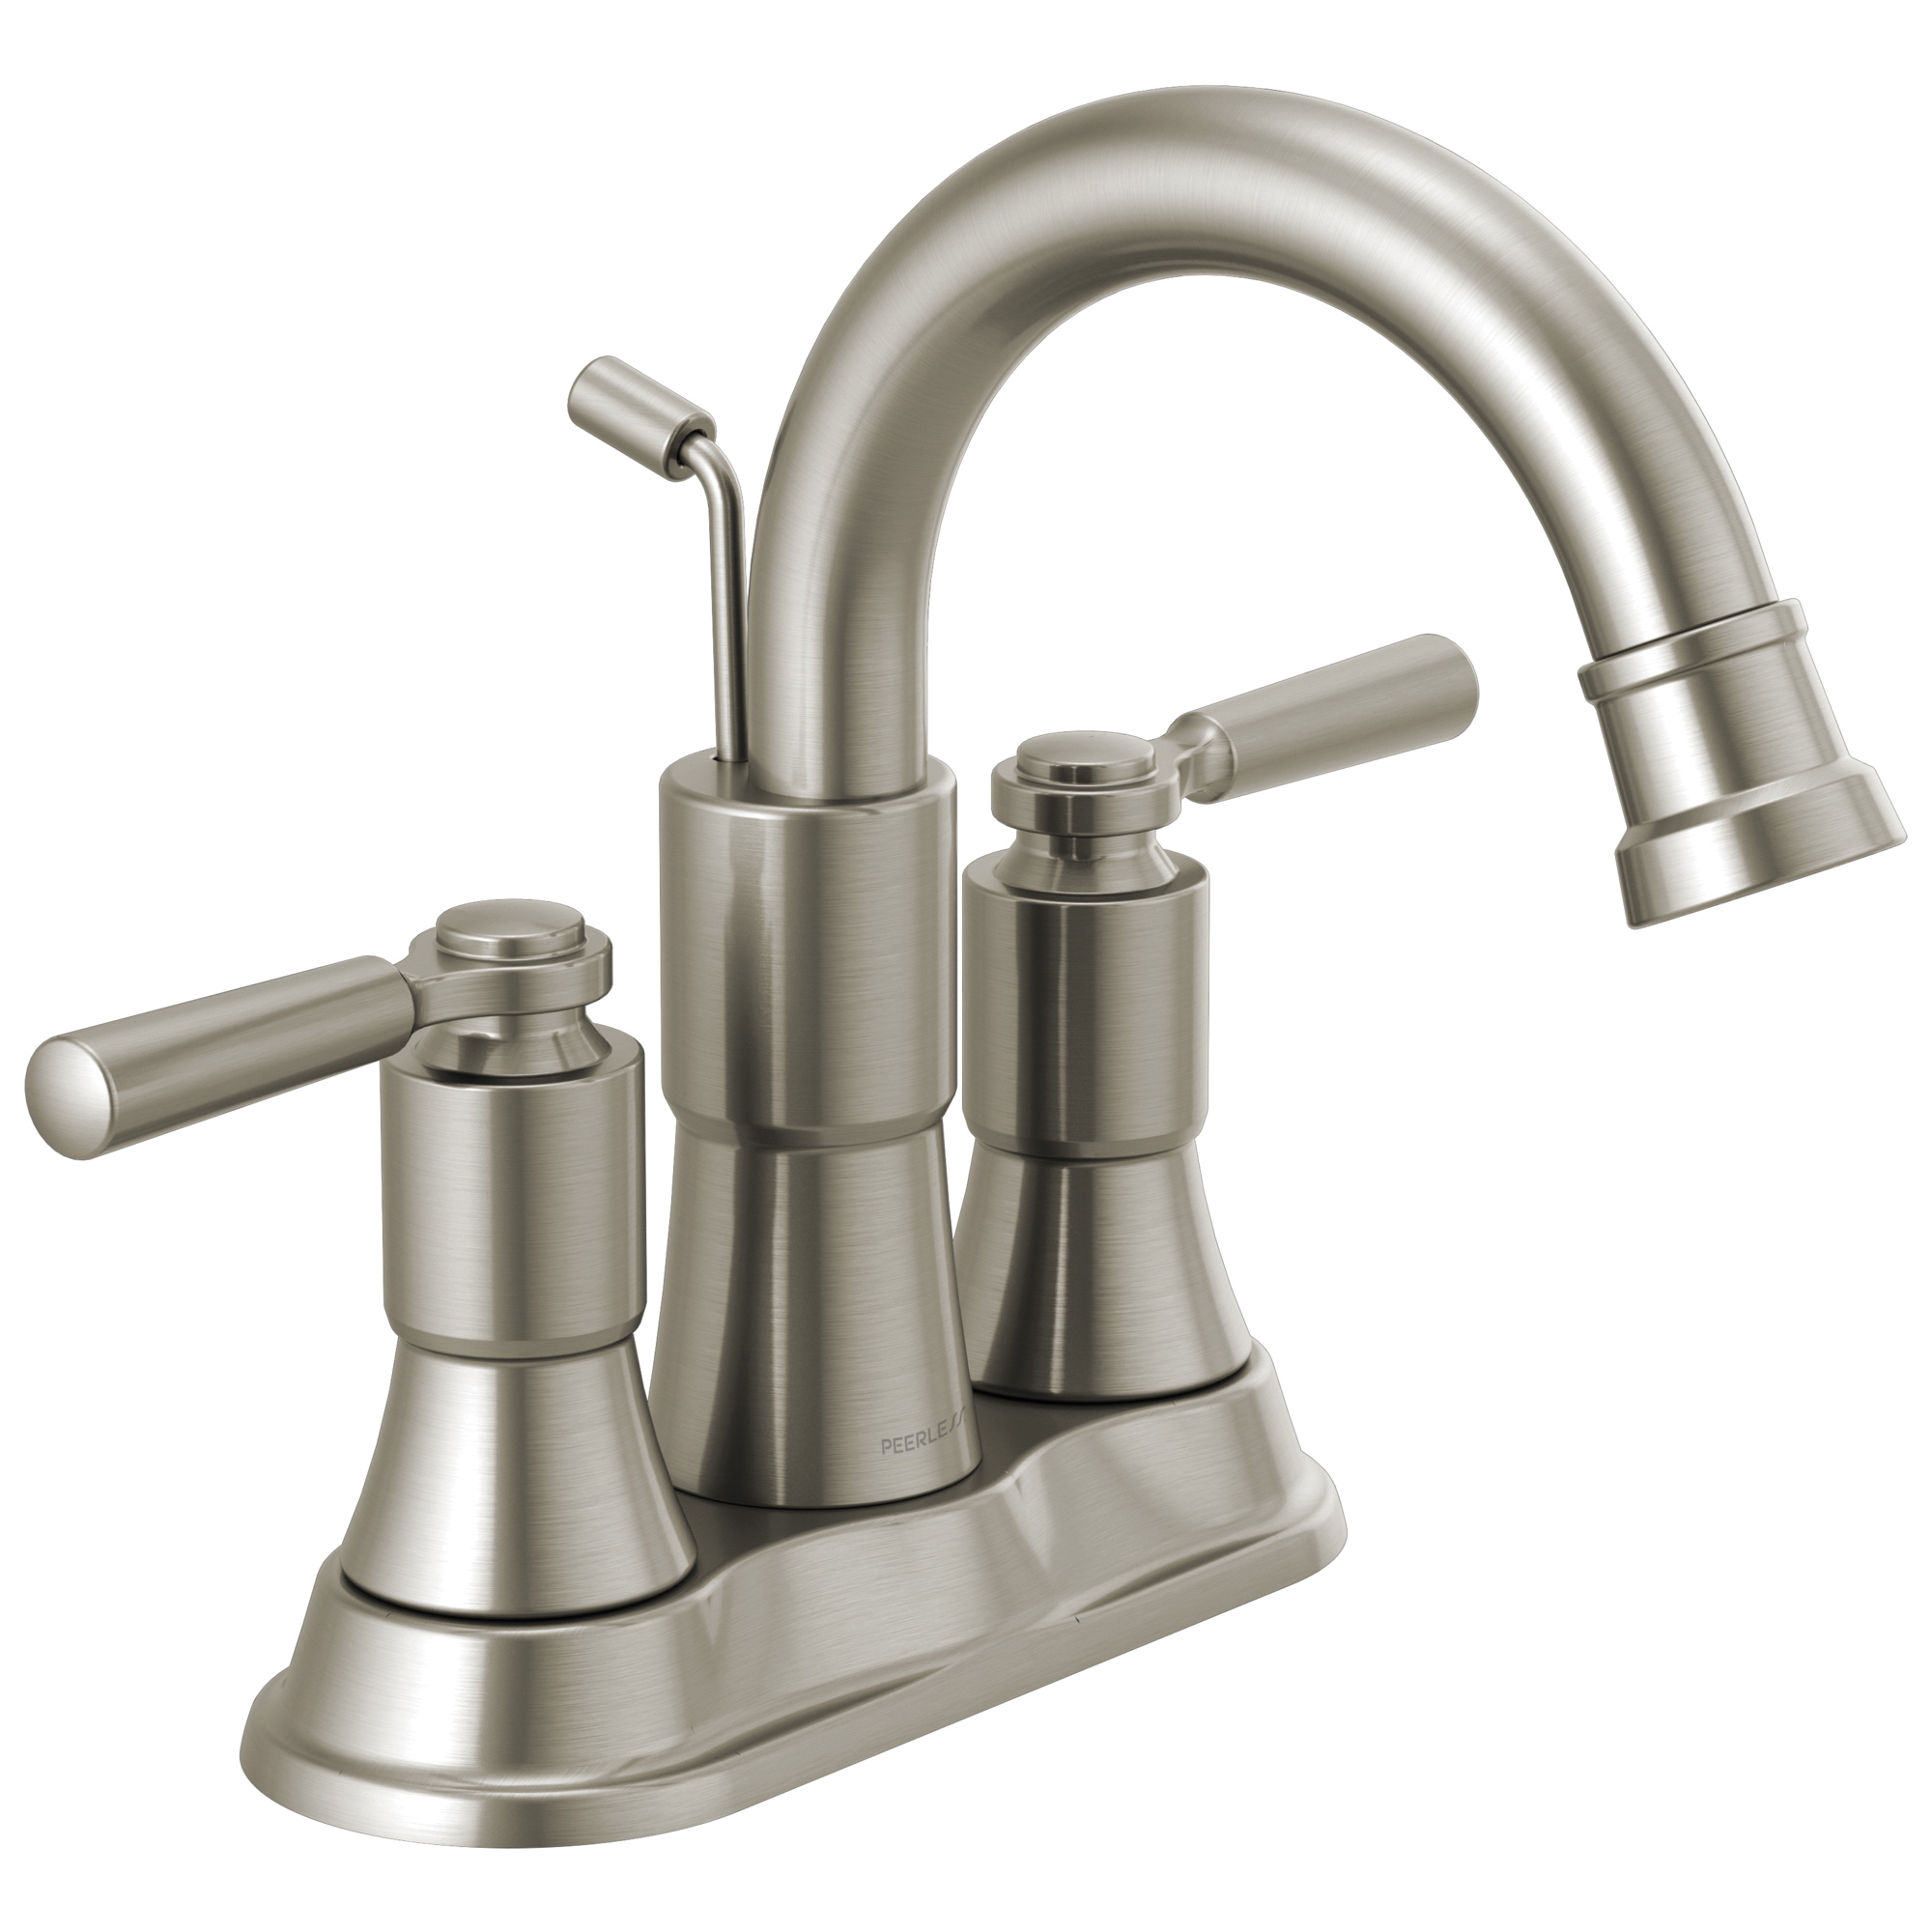 Peerless® P2523LF-BN Centerset Bathroom Faucet, Westchester™, Brushed Nickel, 2 Handles, Pop-Up Drain, 1 gpm